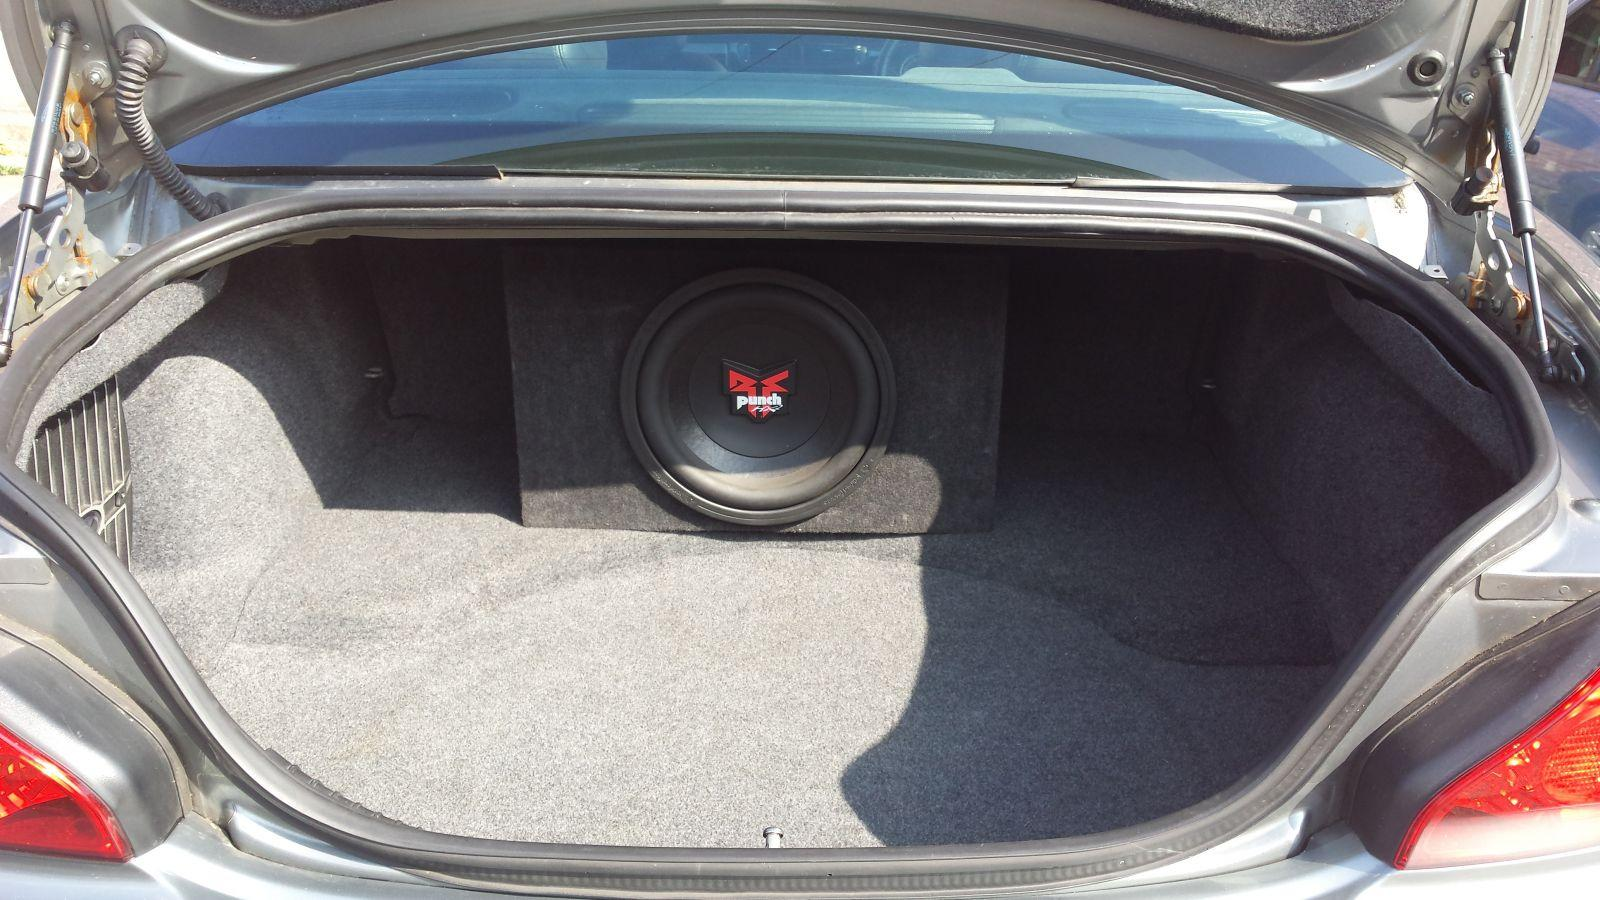 Car stereo 3